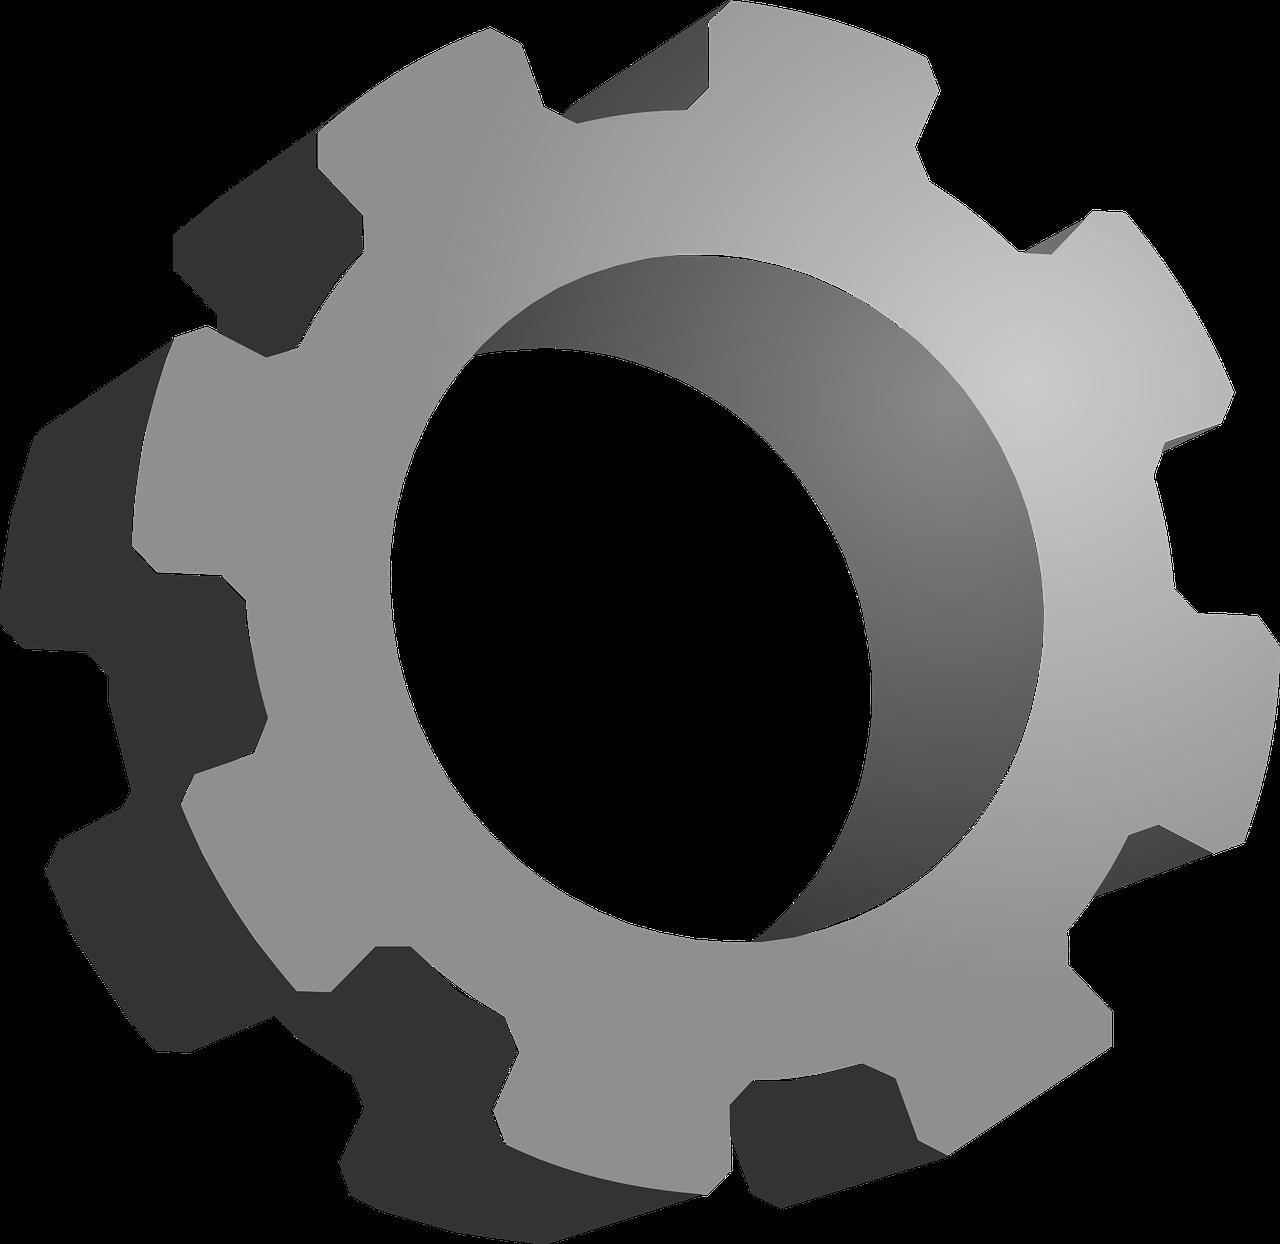 Gear icon mechanical option. Gears clipart grey